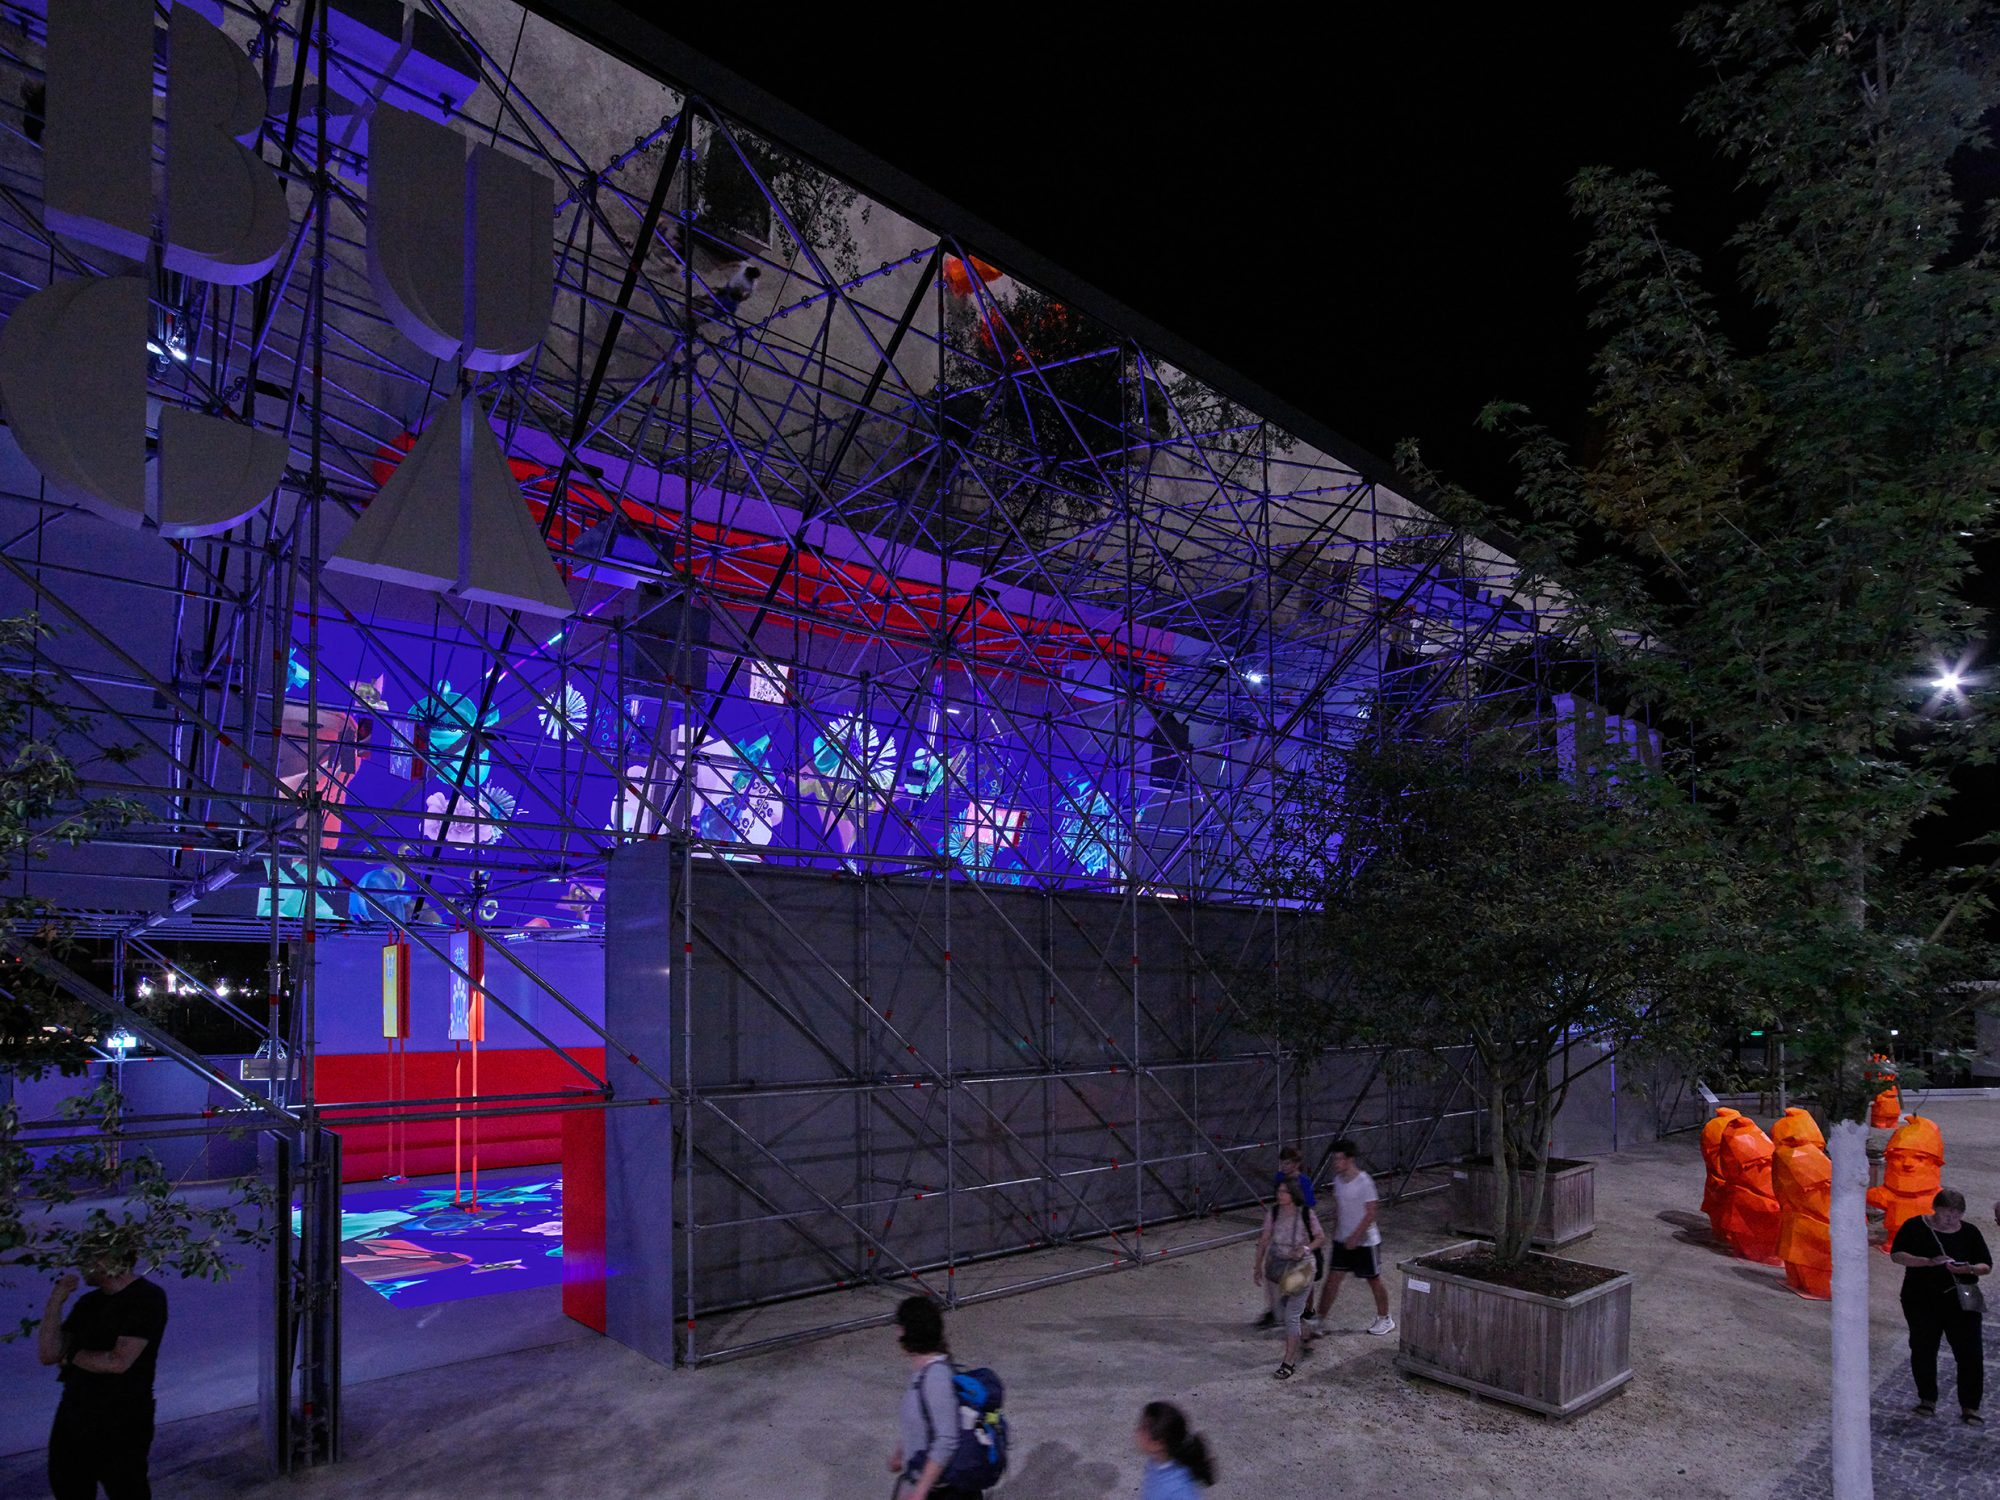 Der BUGA-Pavillon bei Nacht, Entwurf: Joos Keller.